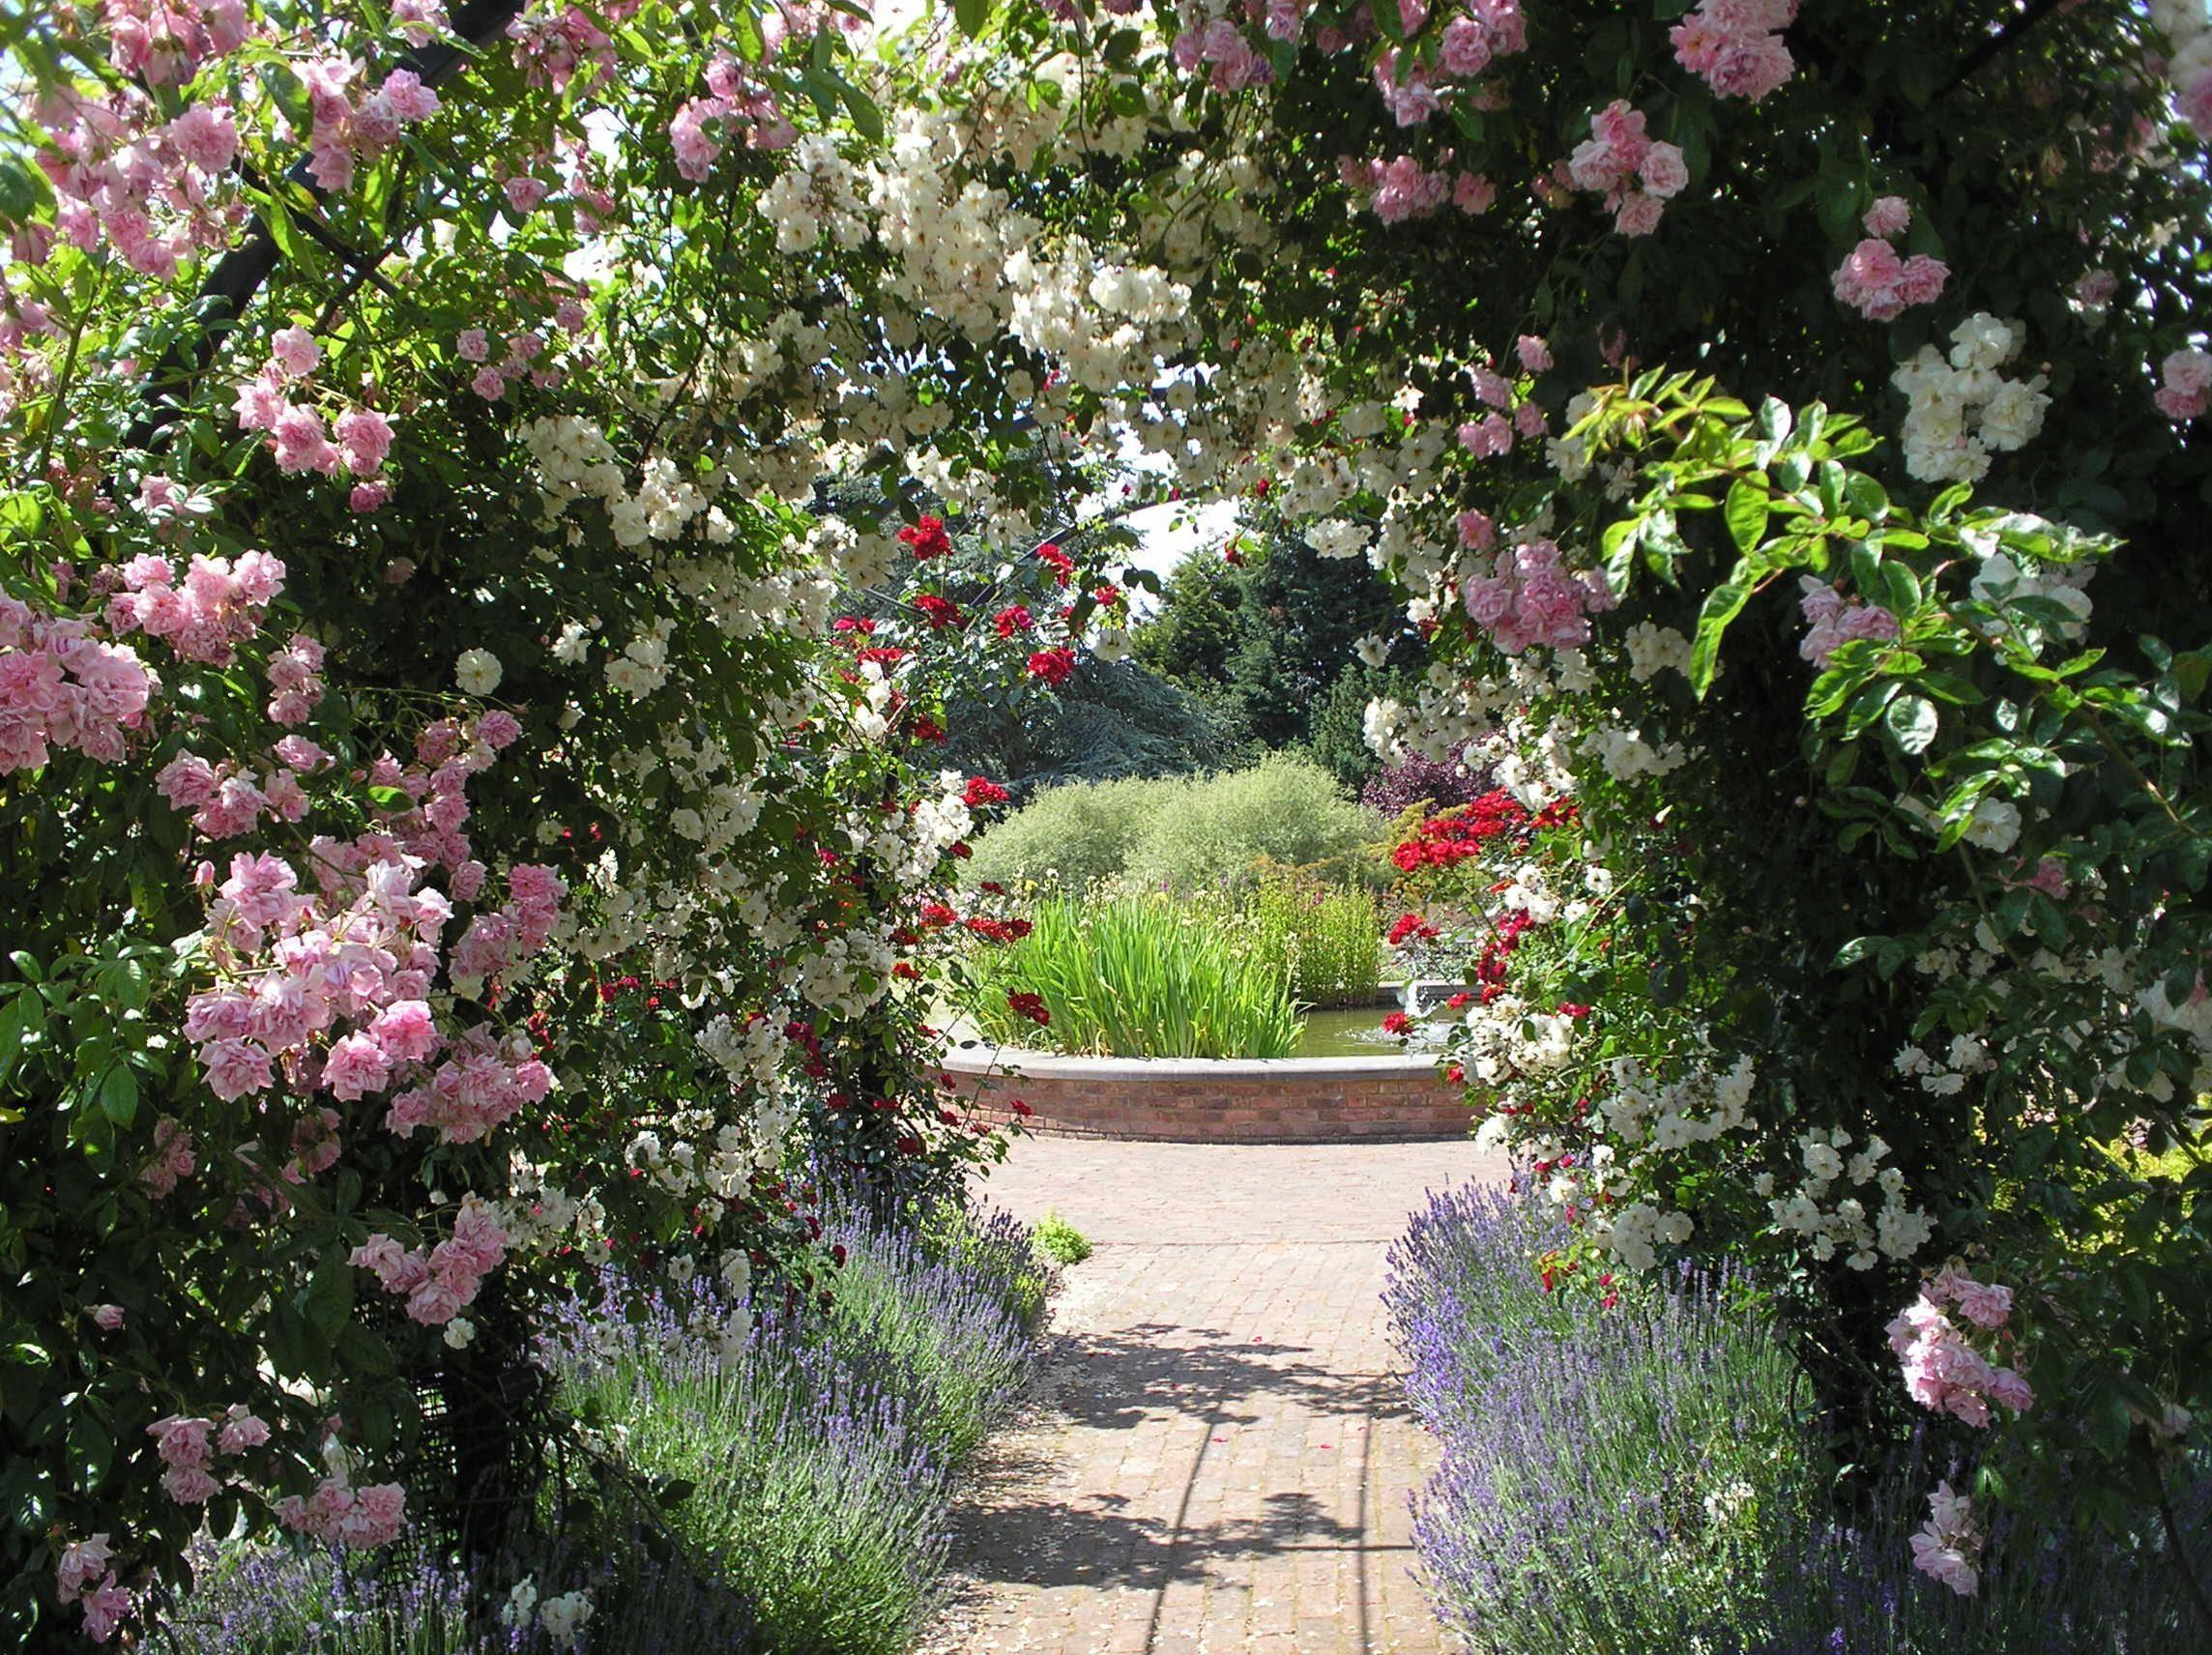 Garden arches u pergolas arches and pergolas are popular garden